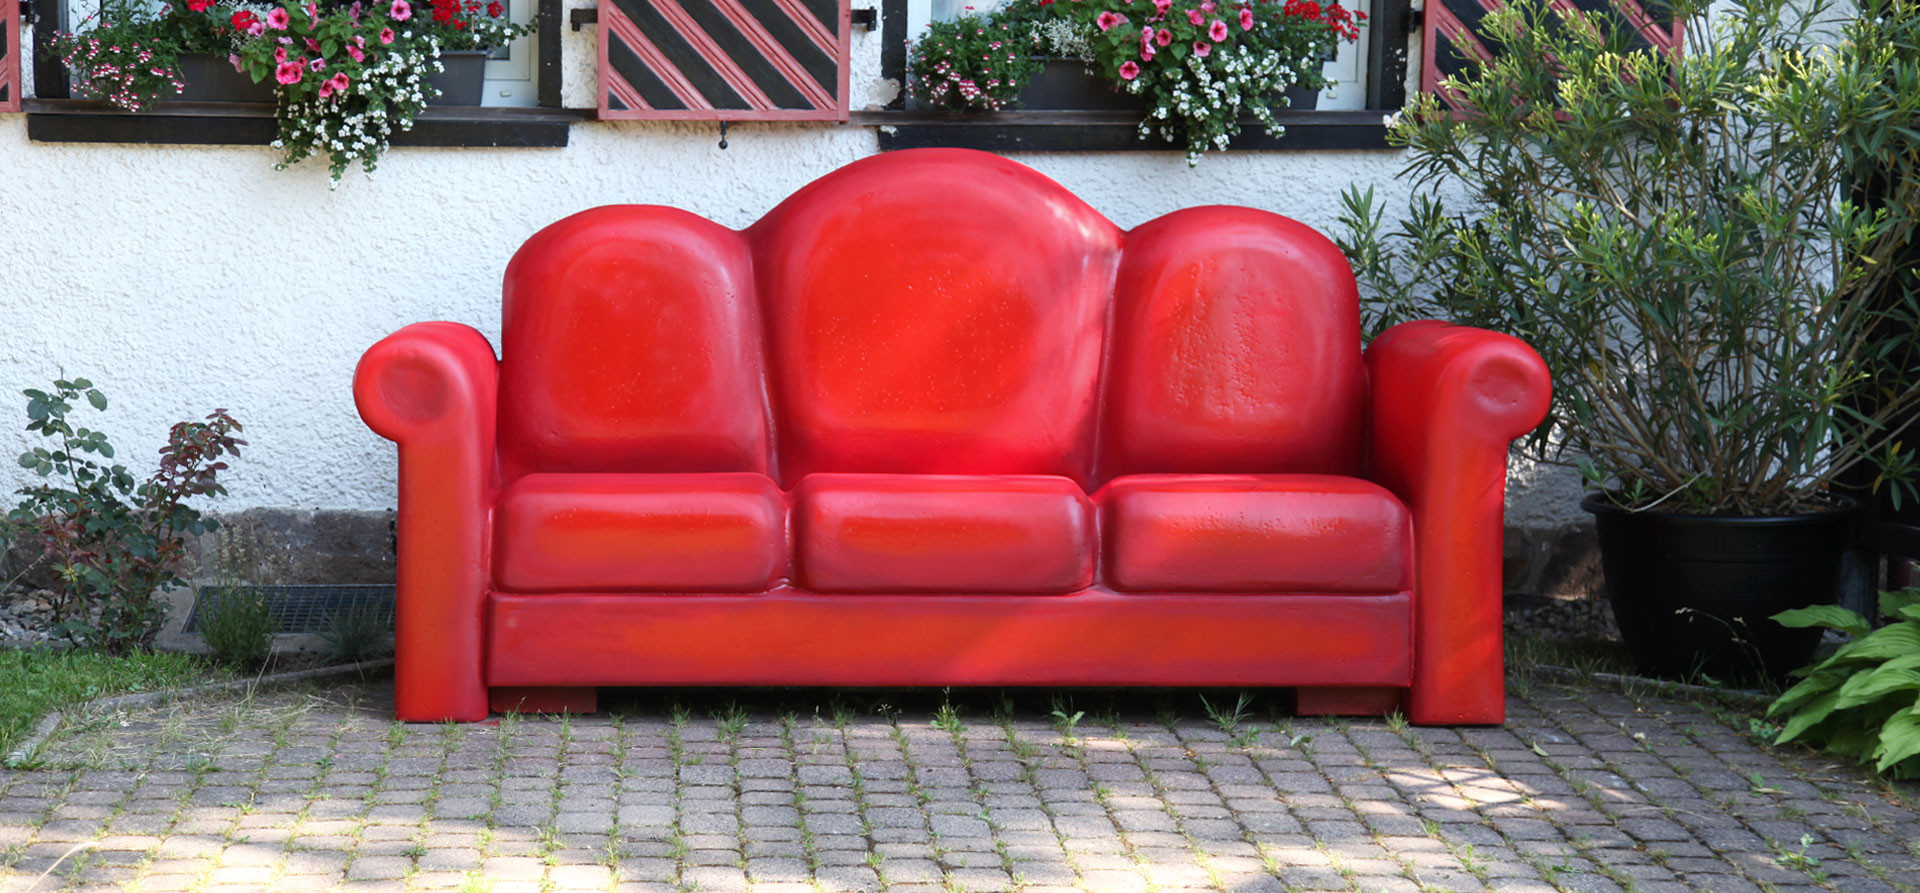 rote Couch Großplastik